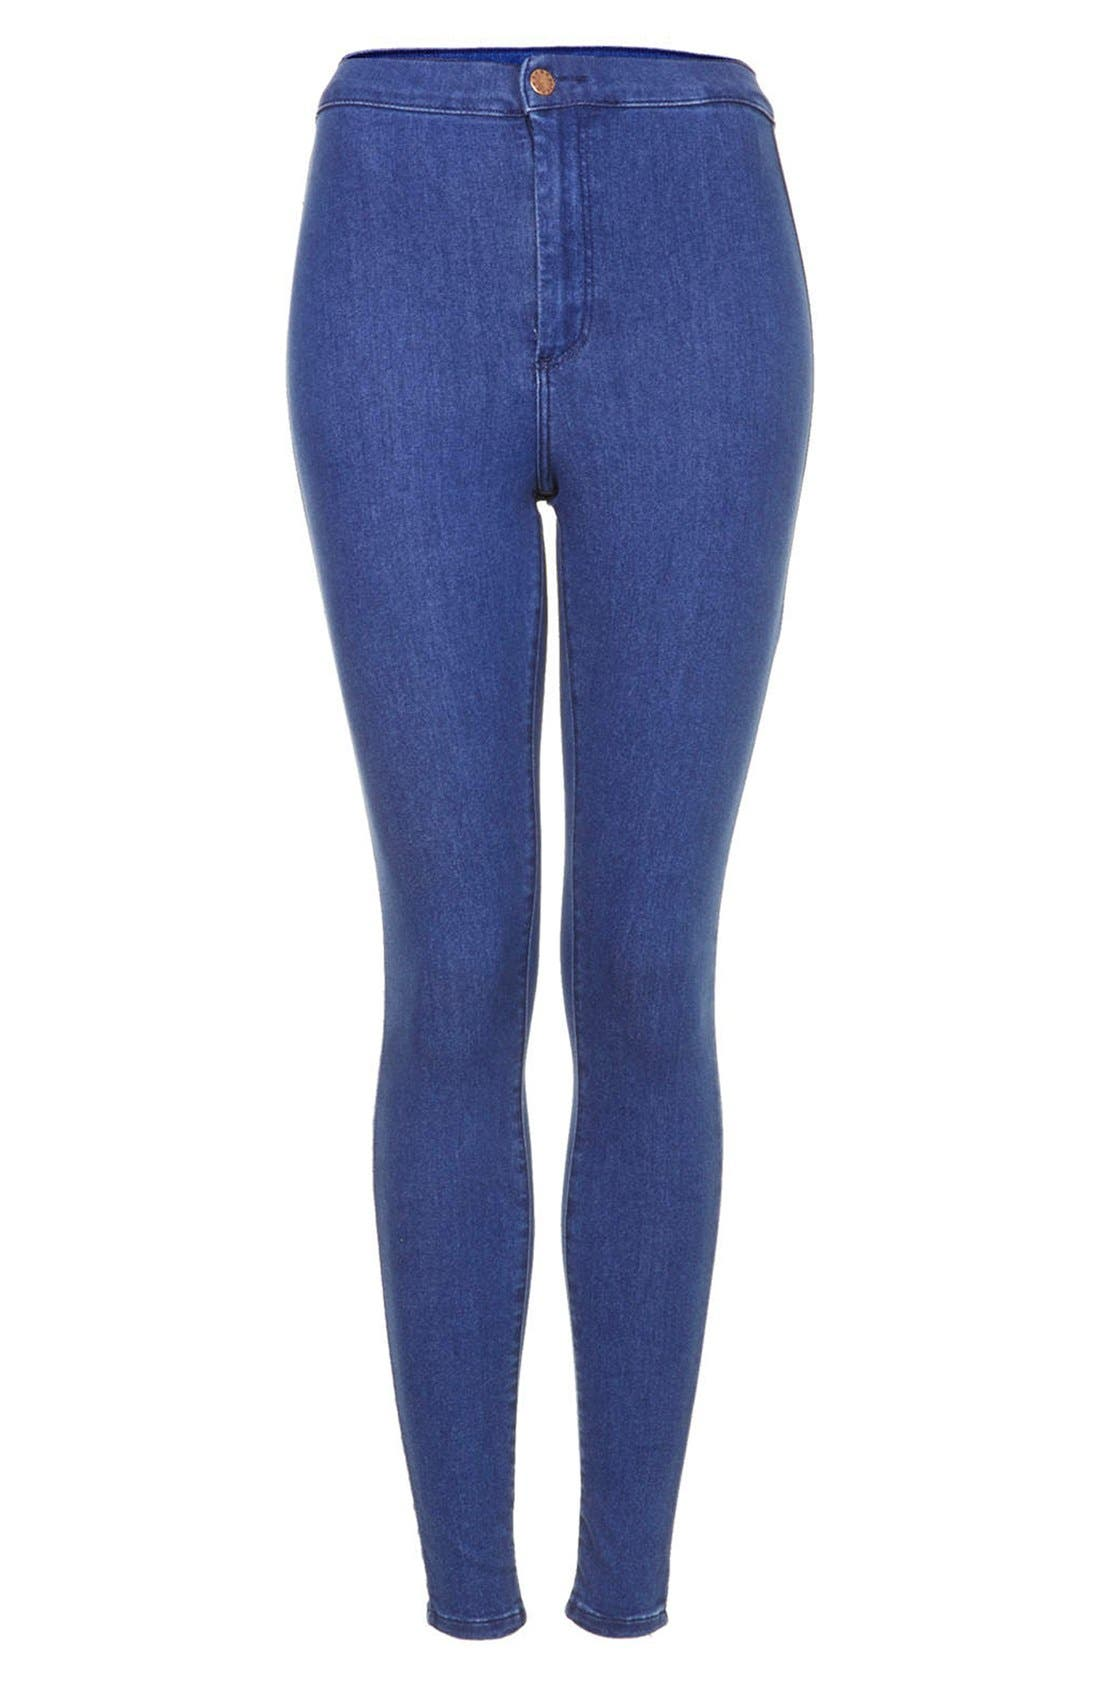 Alternate Image 3  - Topshop Moto 'Joni' High Rise Skinny Jeans (Regular, Short & Long) (Blue)